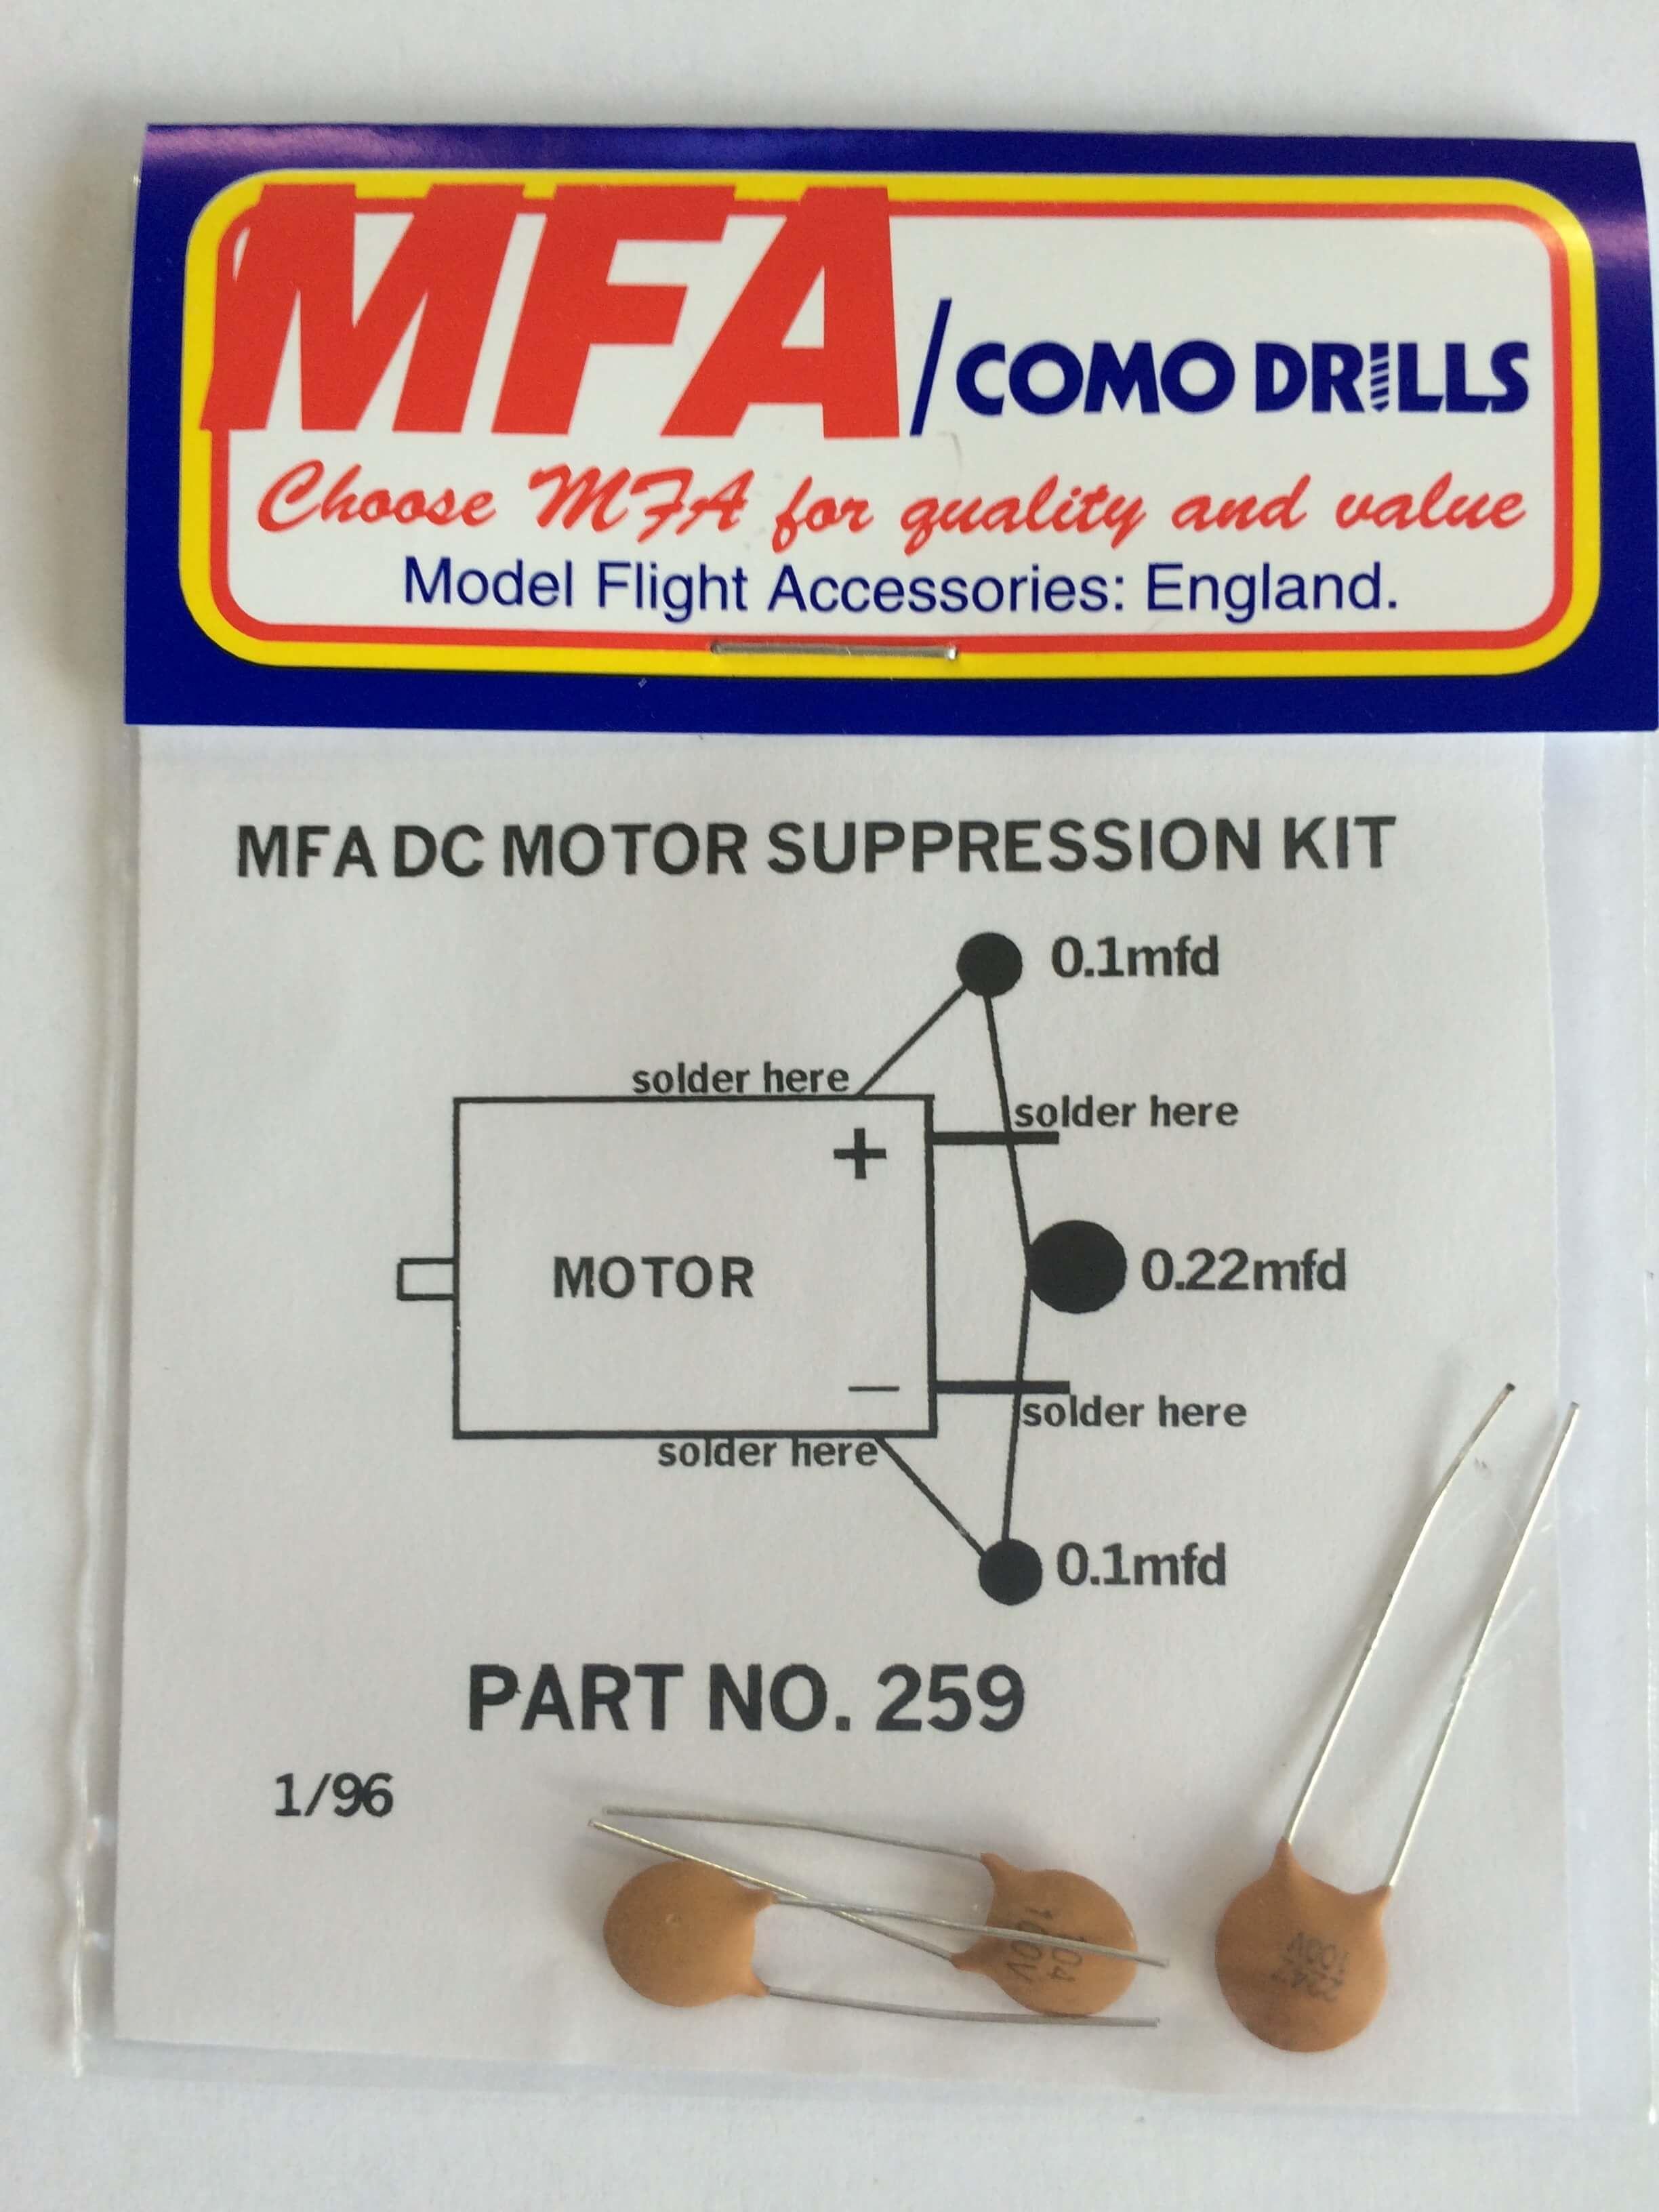 MFA DC Motor Suppression Kit